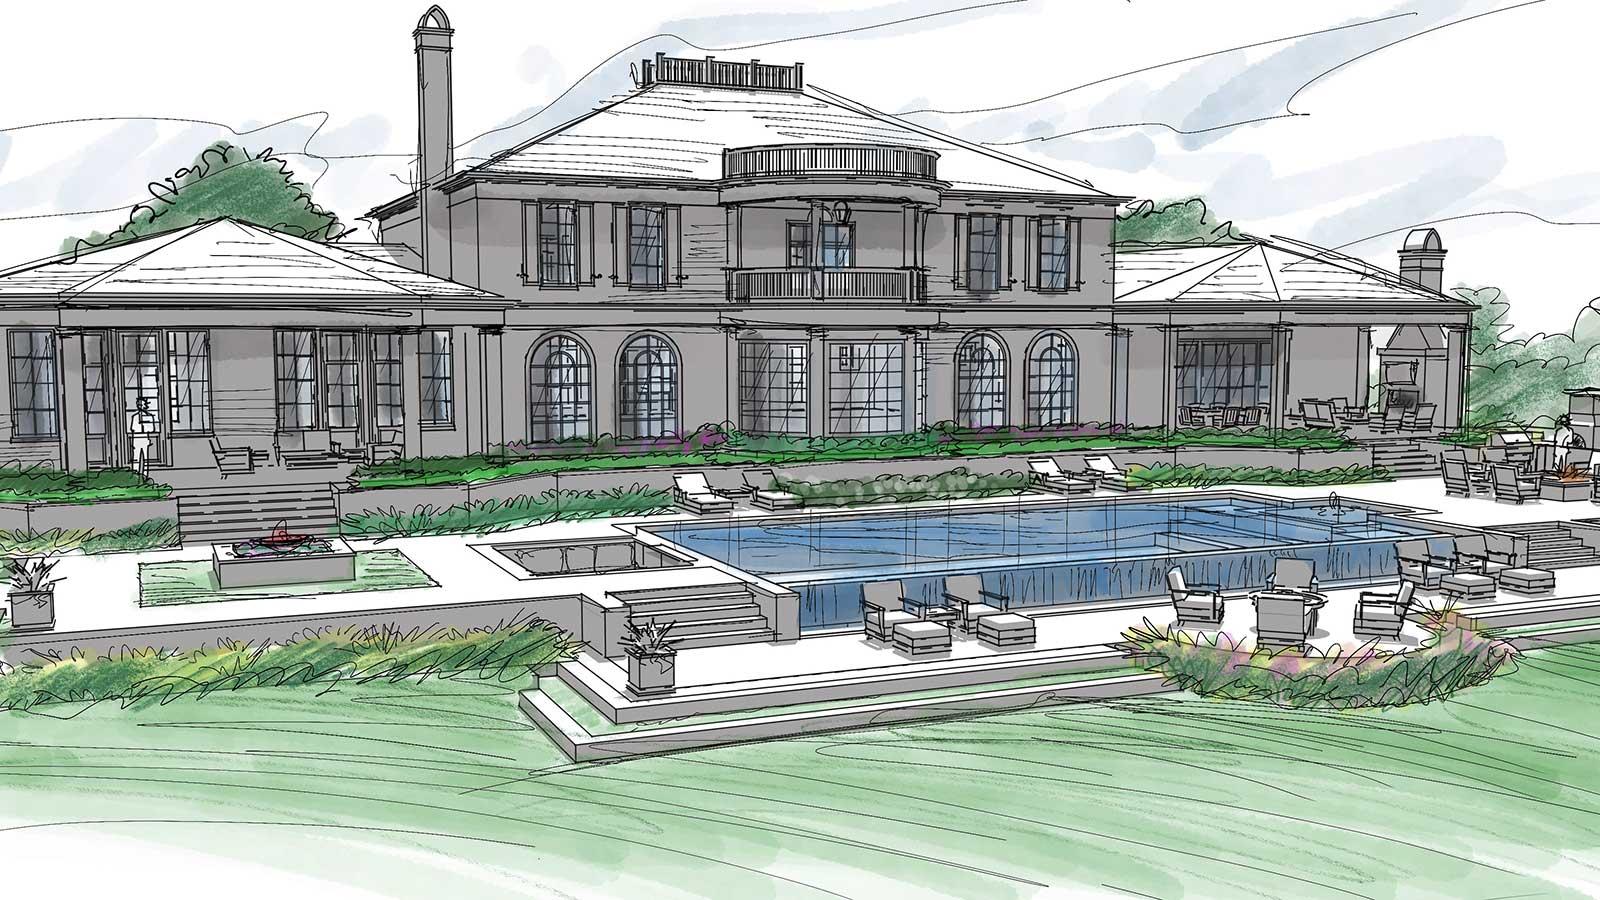 ddla-design-ranch-house-sketch2.jpg